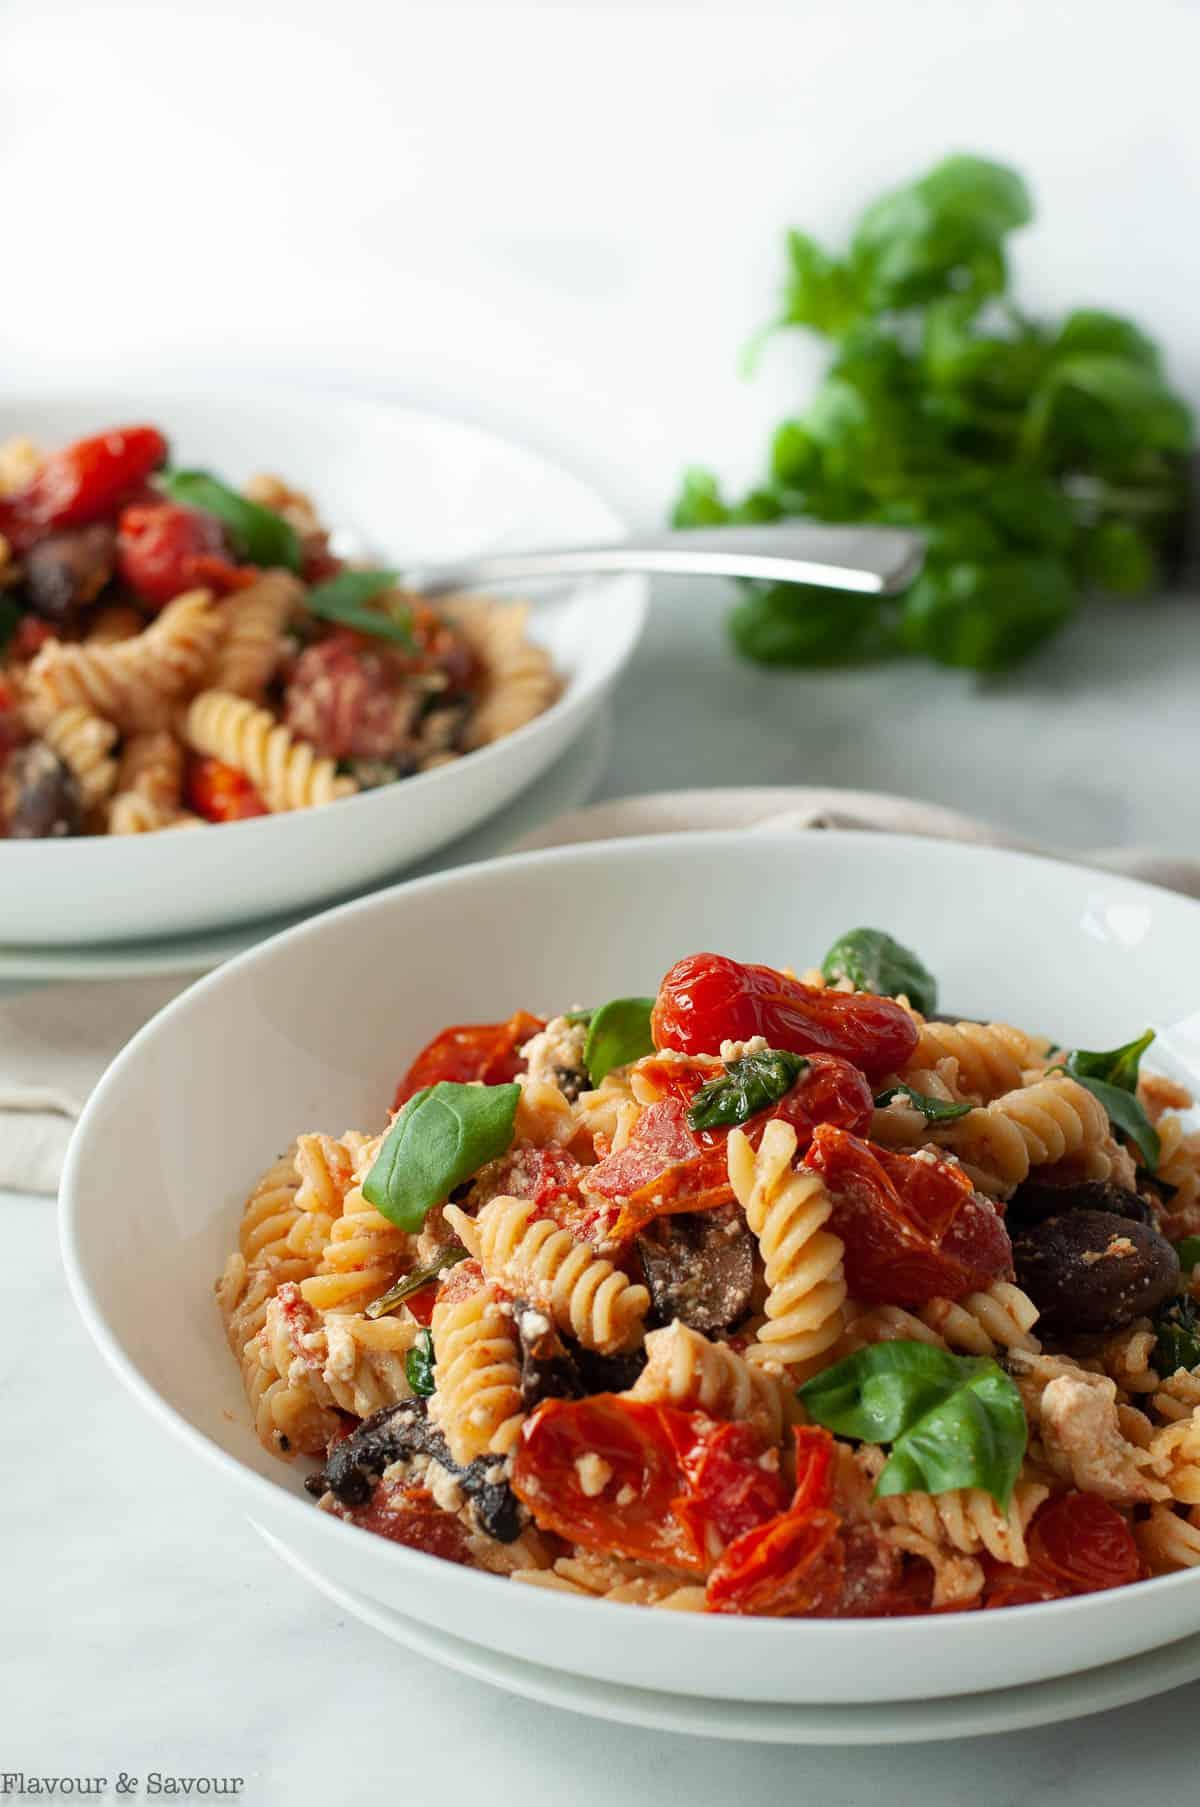 Gluten-free Feta Tomato Pasta Bake in bowls